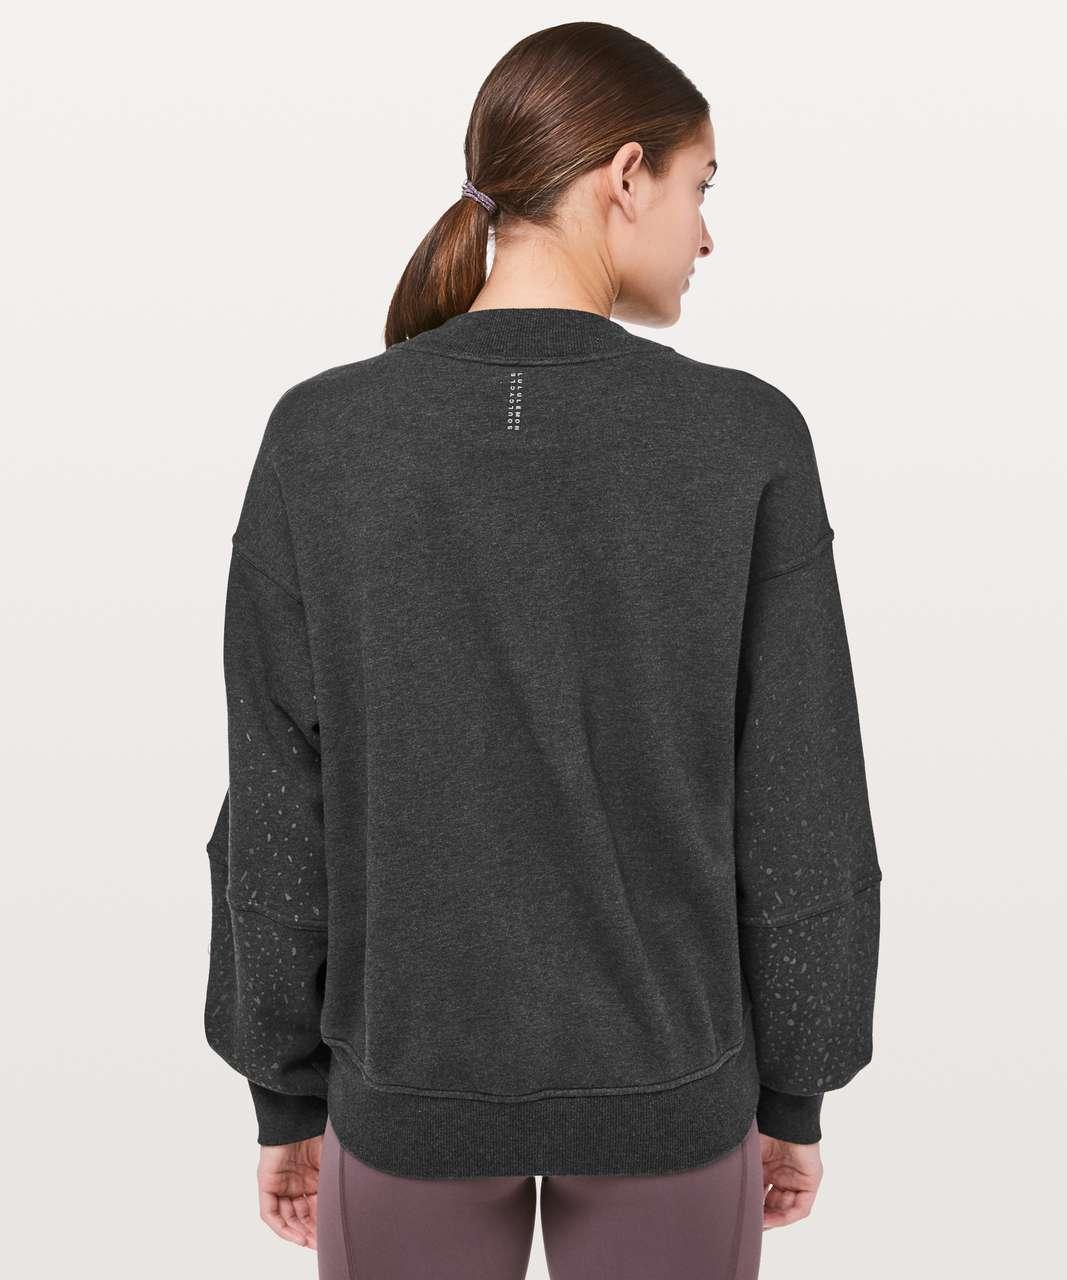 Lululemon To The Beat Sweatshirt *lululemon X SoulCycle - Heathered Black